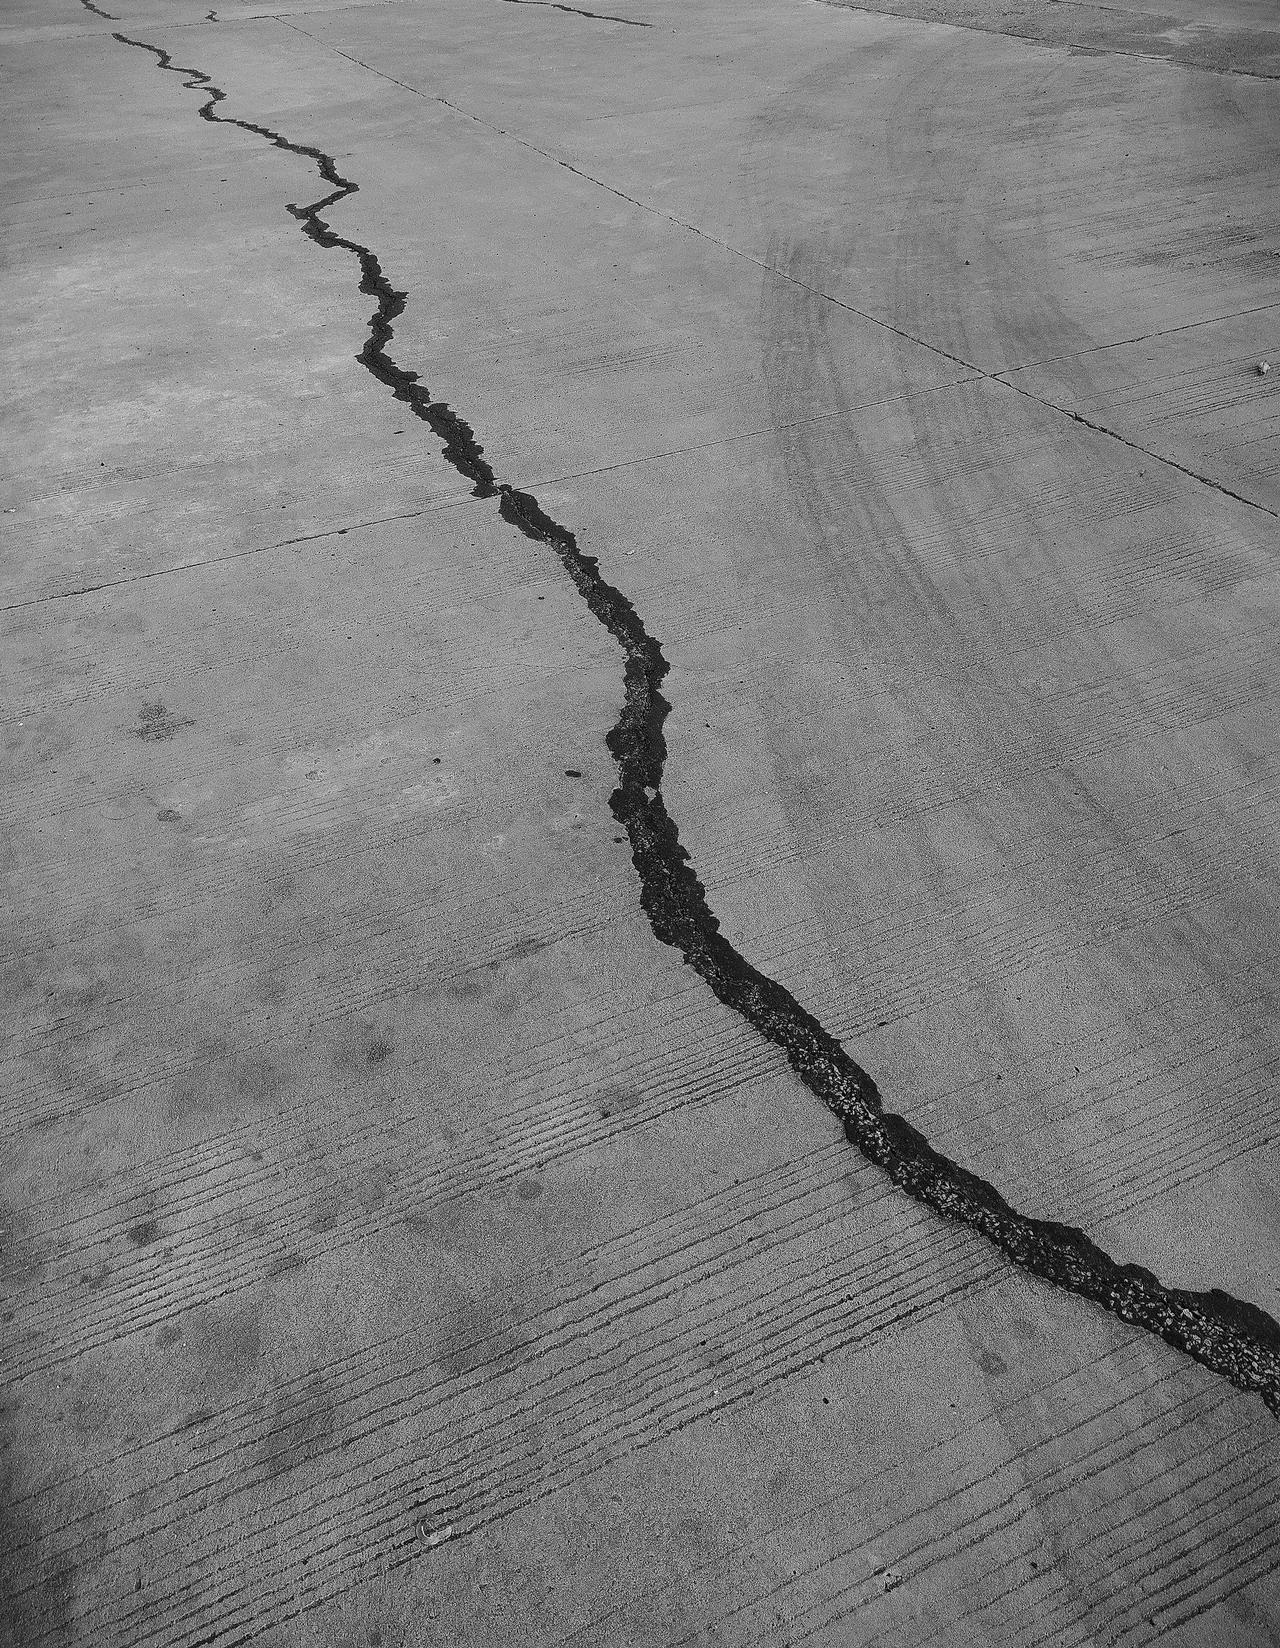 How to Make Earthquake Insurance in San Francisco Cheaper